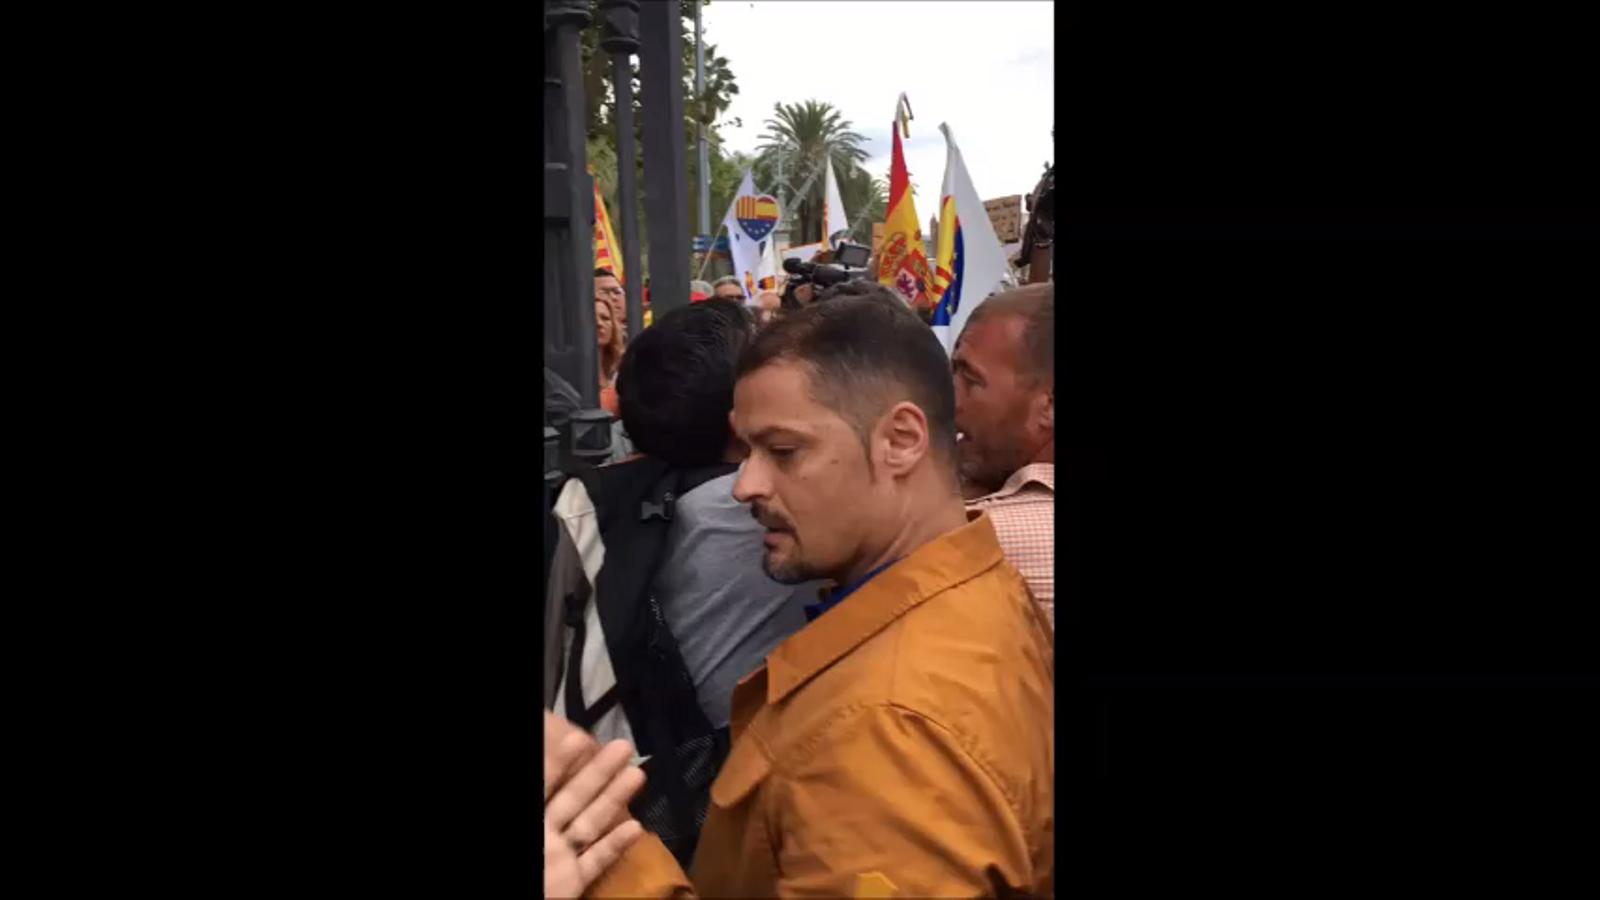 Manifestants espanyolistes insulten i agredeixen un home a la Ciutadella